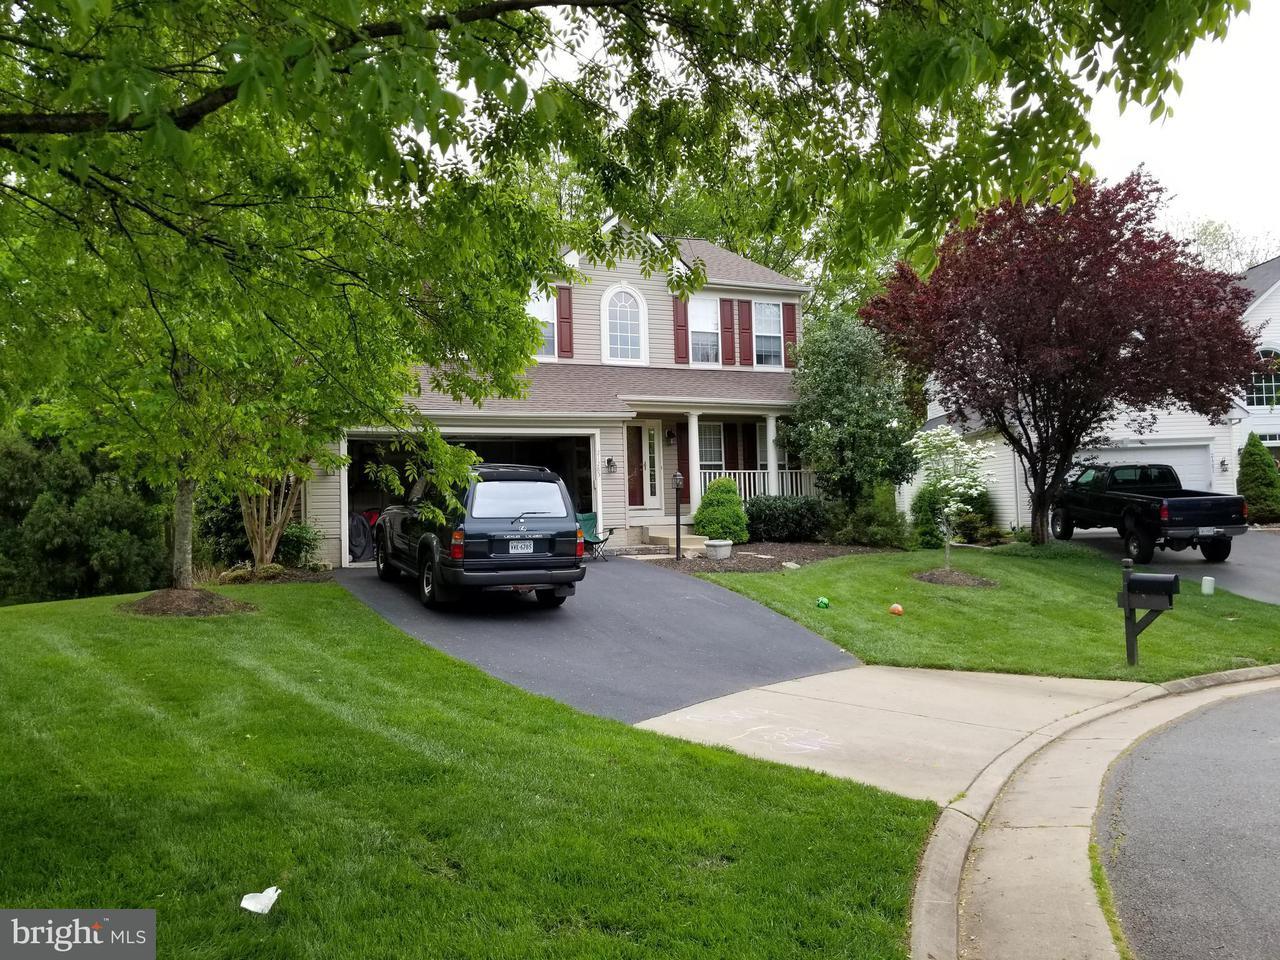 Other Residential for Rent at 21285 Hidden Pond Pl Broadlands, Virginia 20148 United States